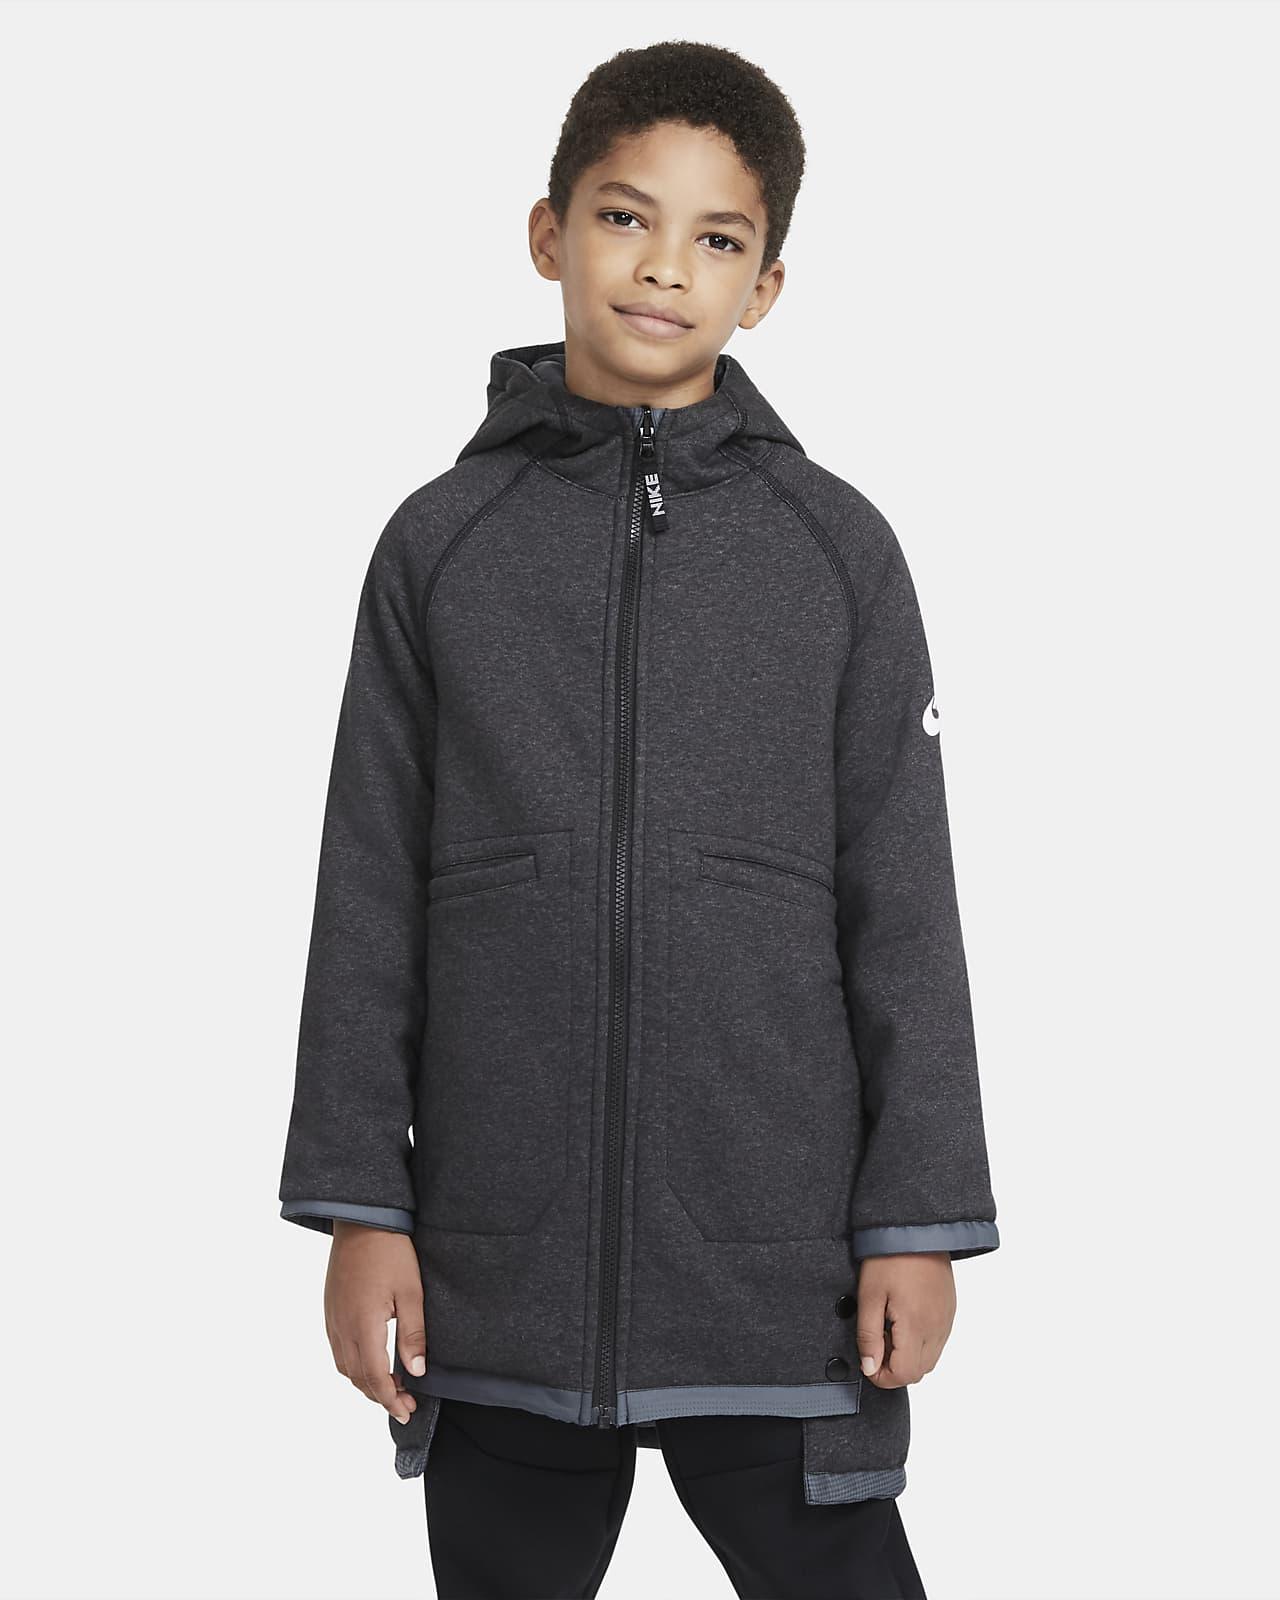 Nike Sportswear Parca reversible - Nen/a